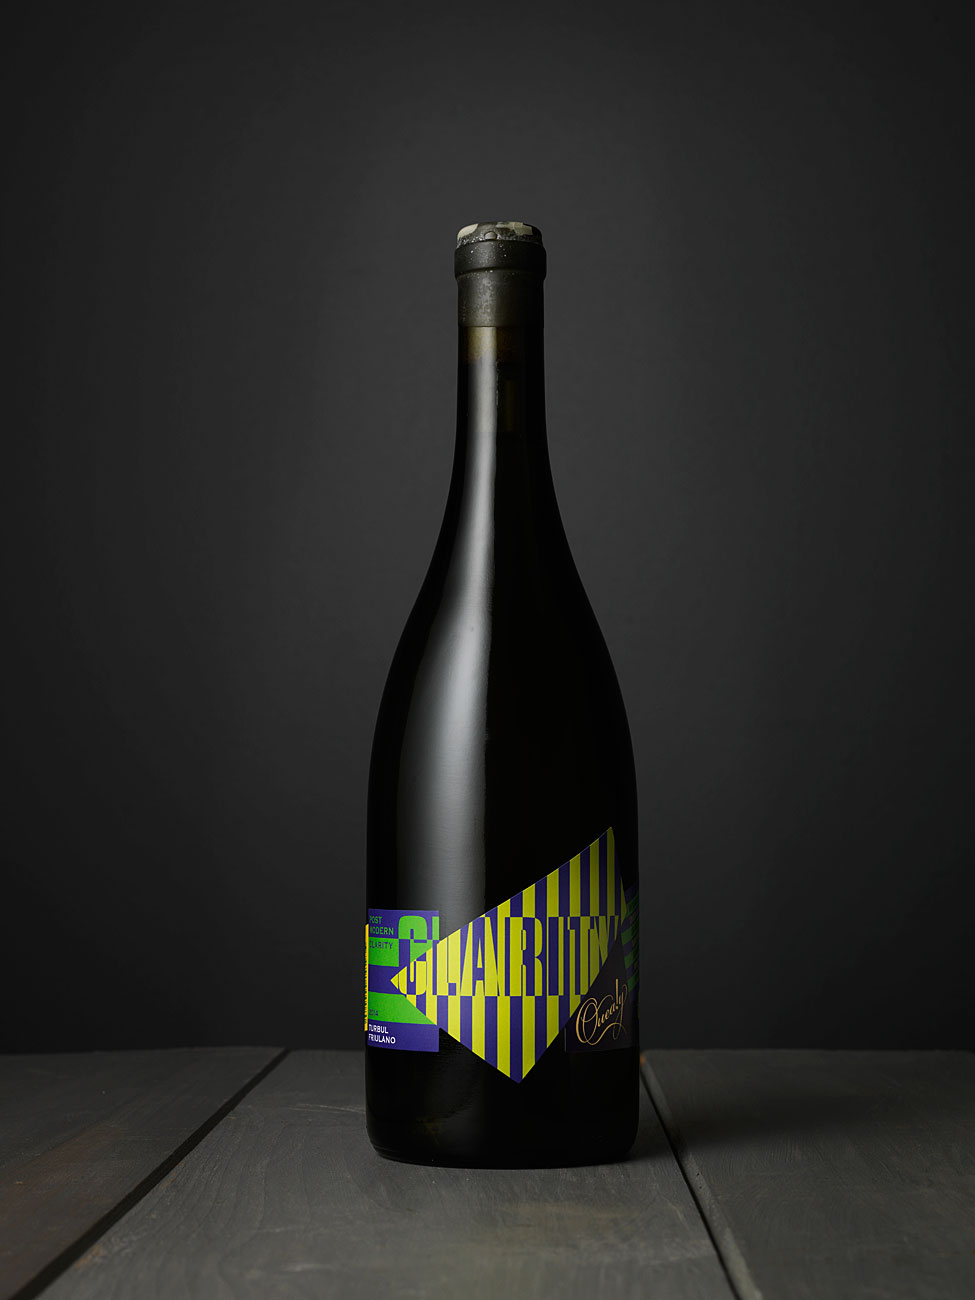 wine-bottle-photography-ijproductions8.jpg